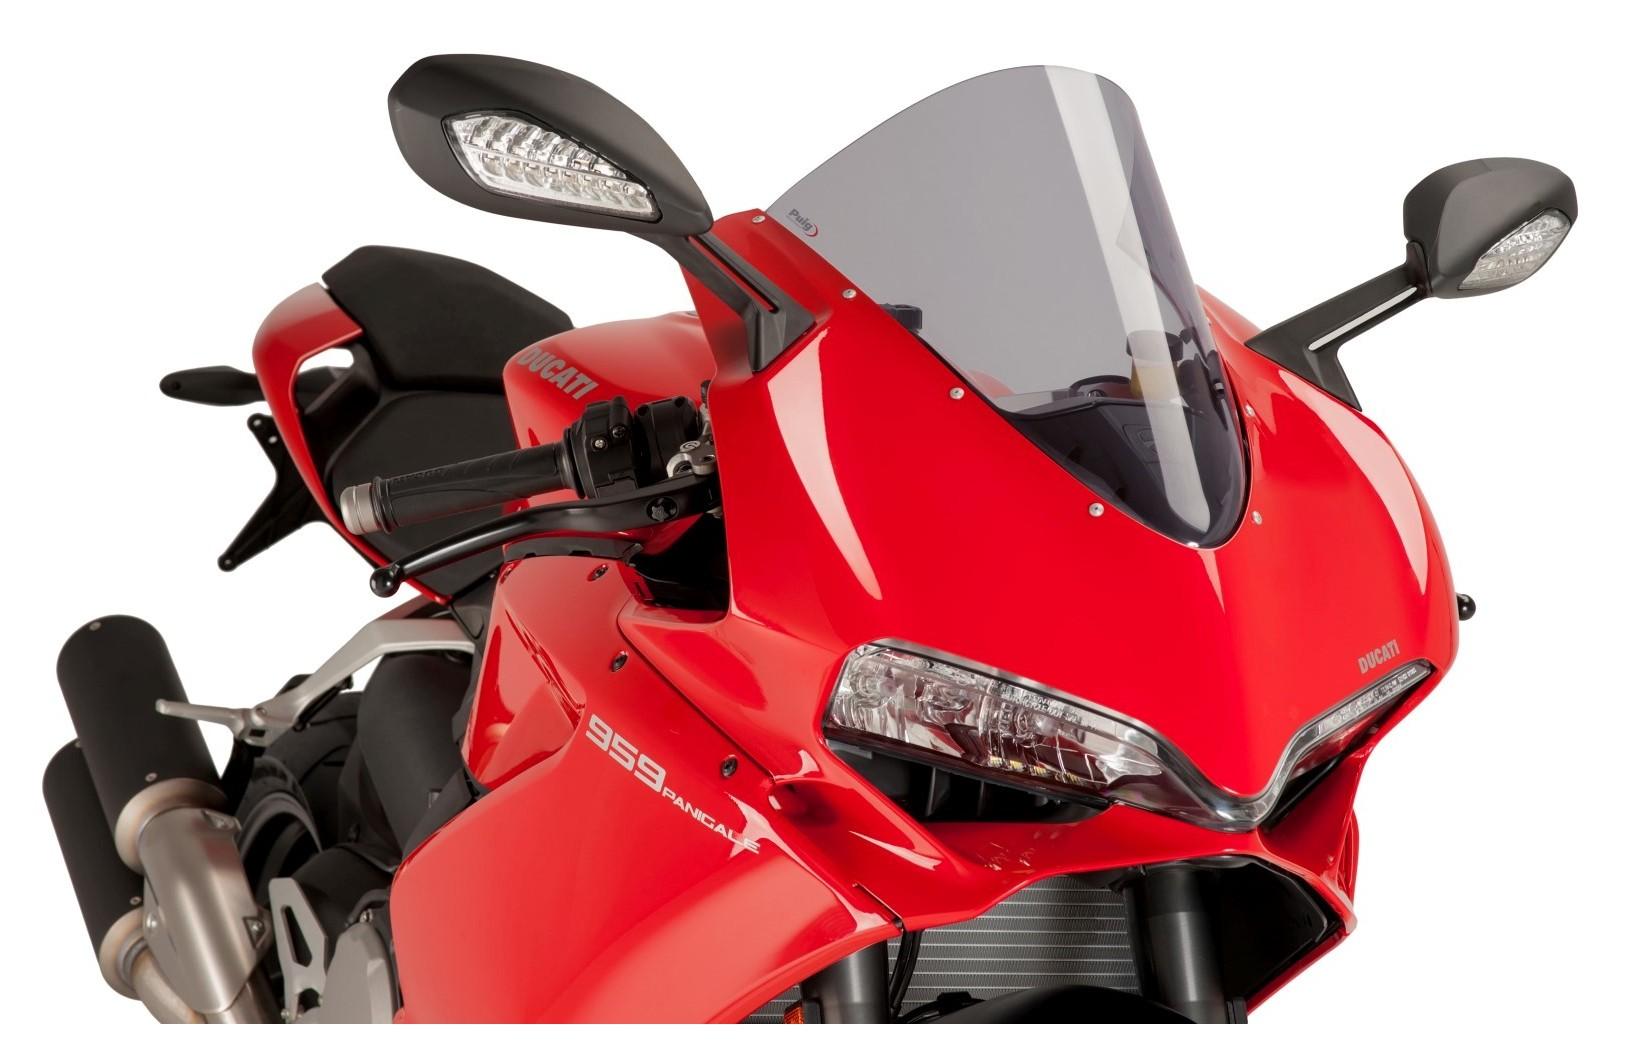 Puig Dark Smoke Grey Racing Screen Windshield Ducati Panigale 1100 V4 S ABS 2018